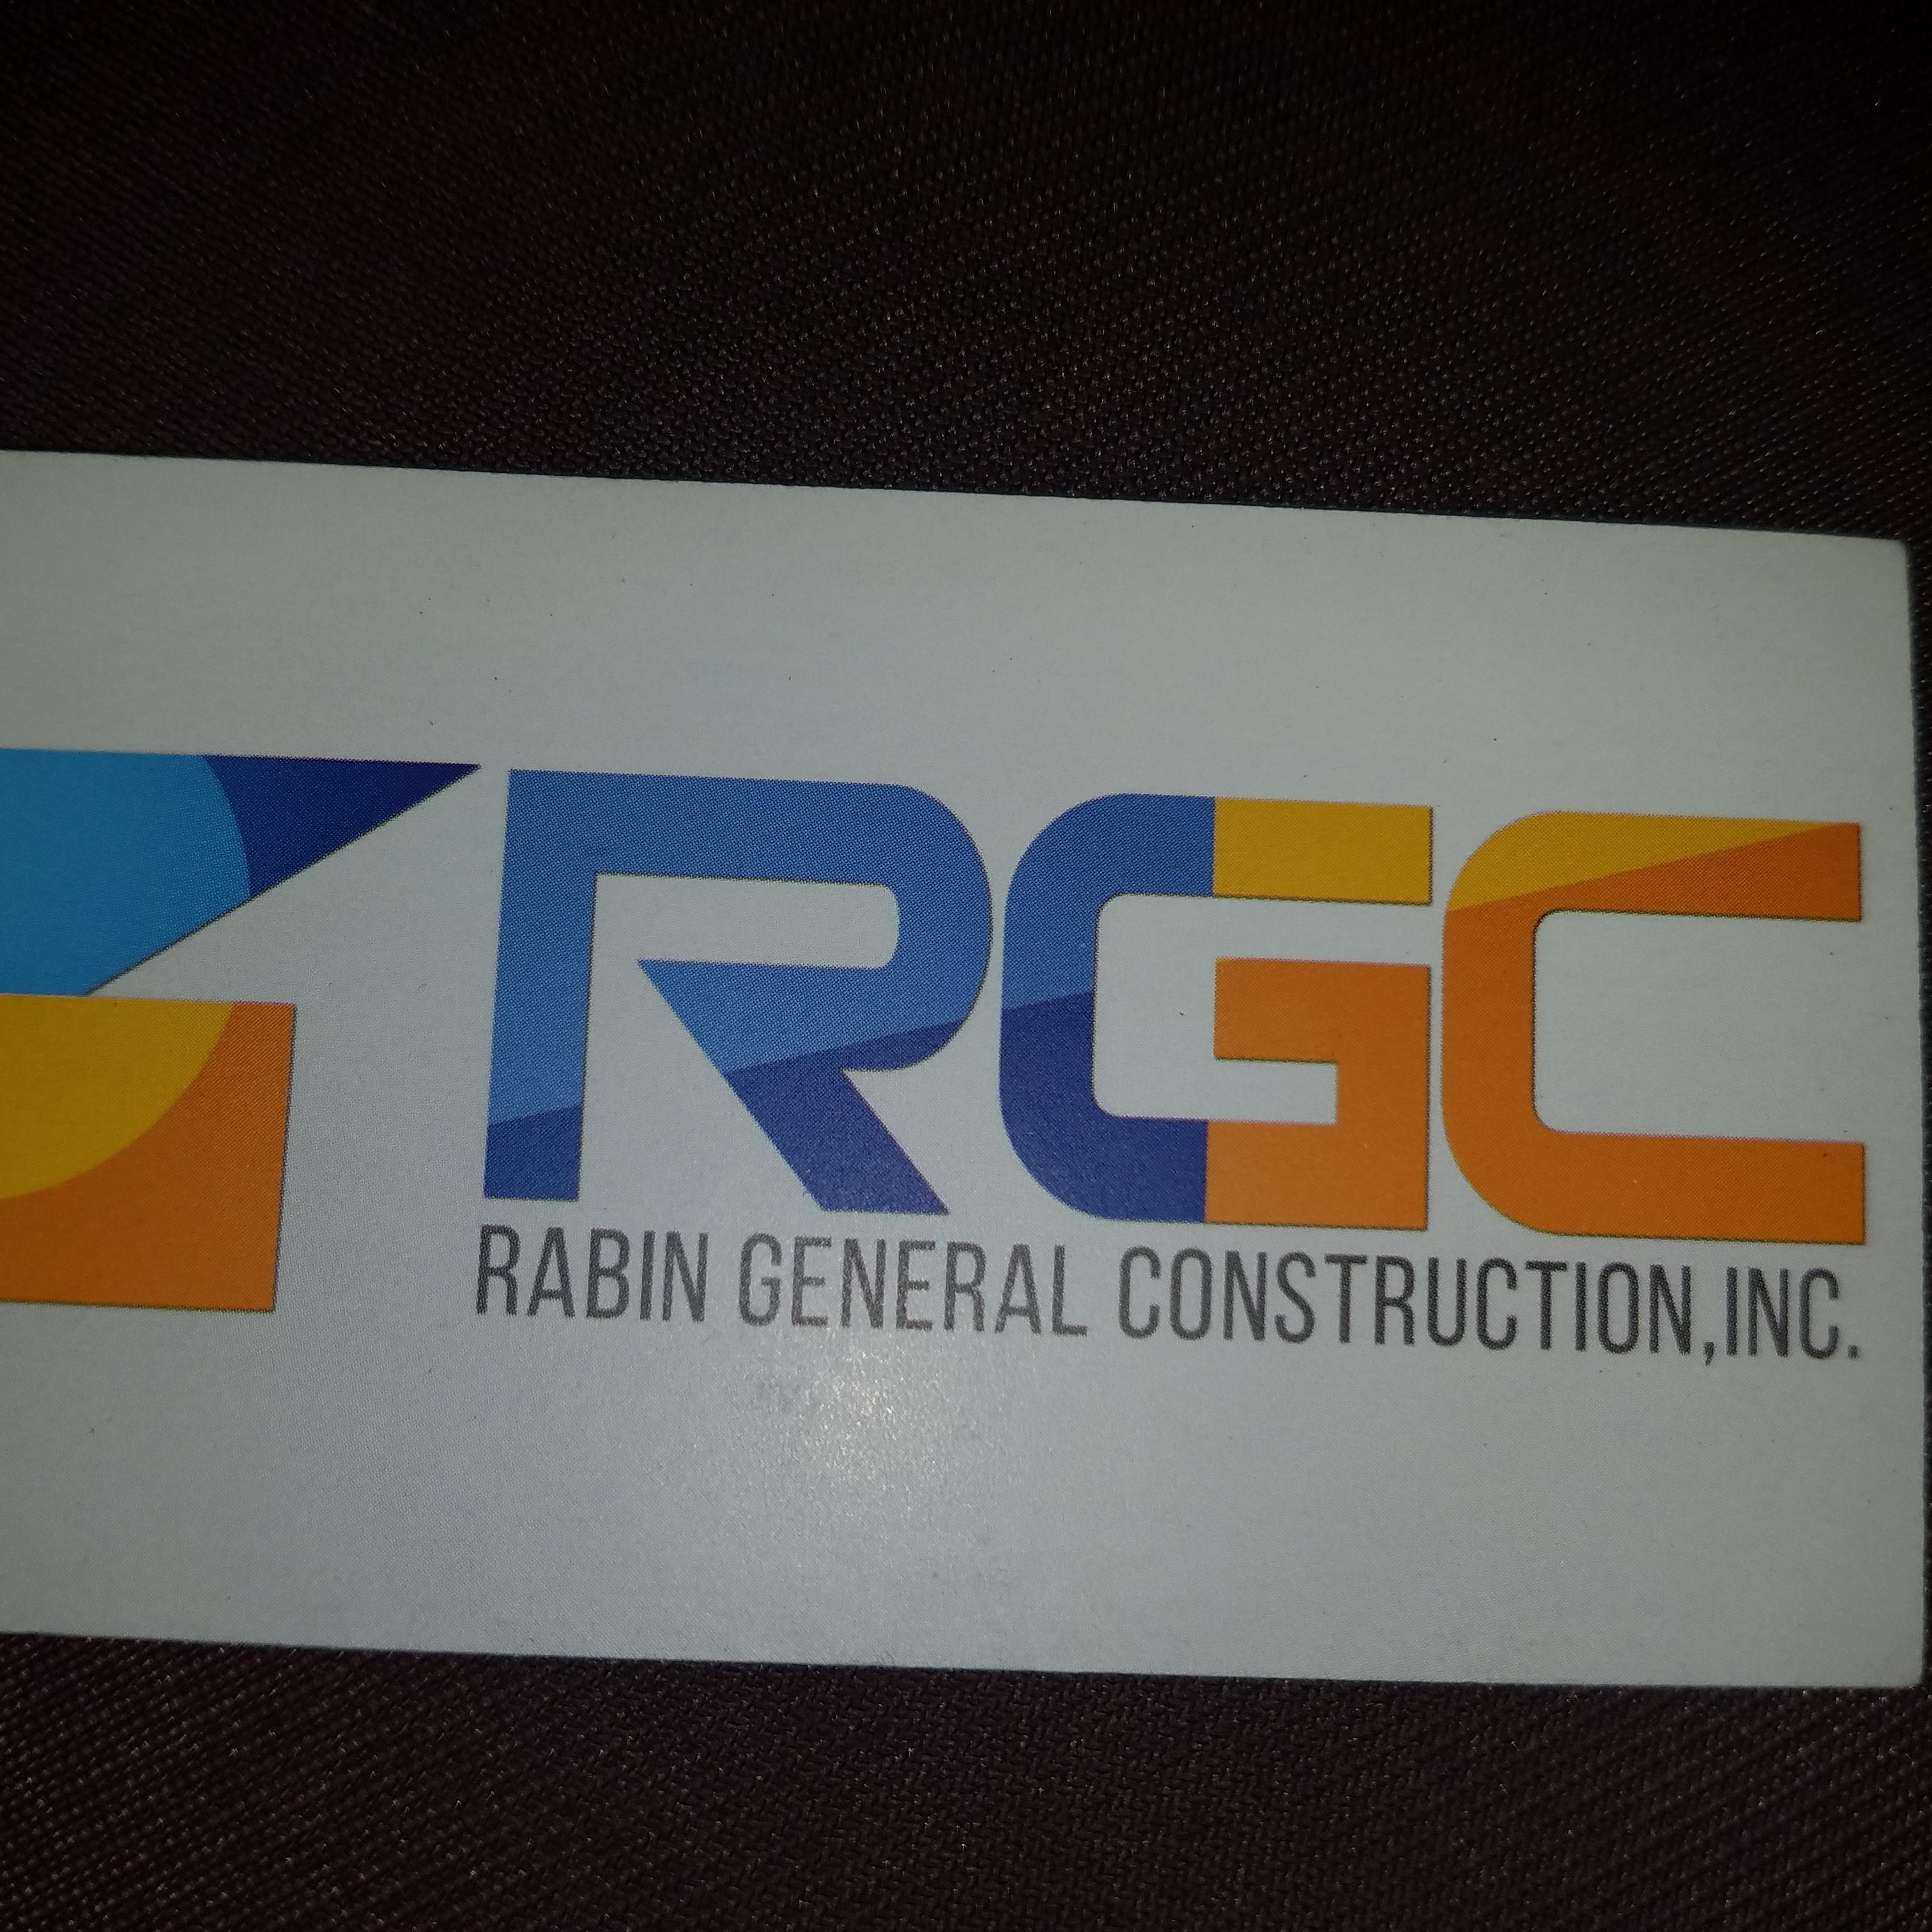 Rabin General Construction Inc